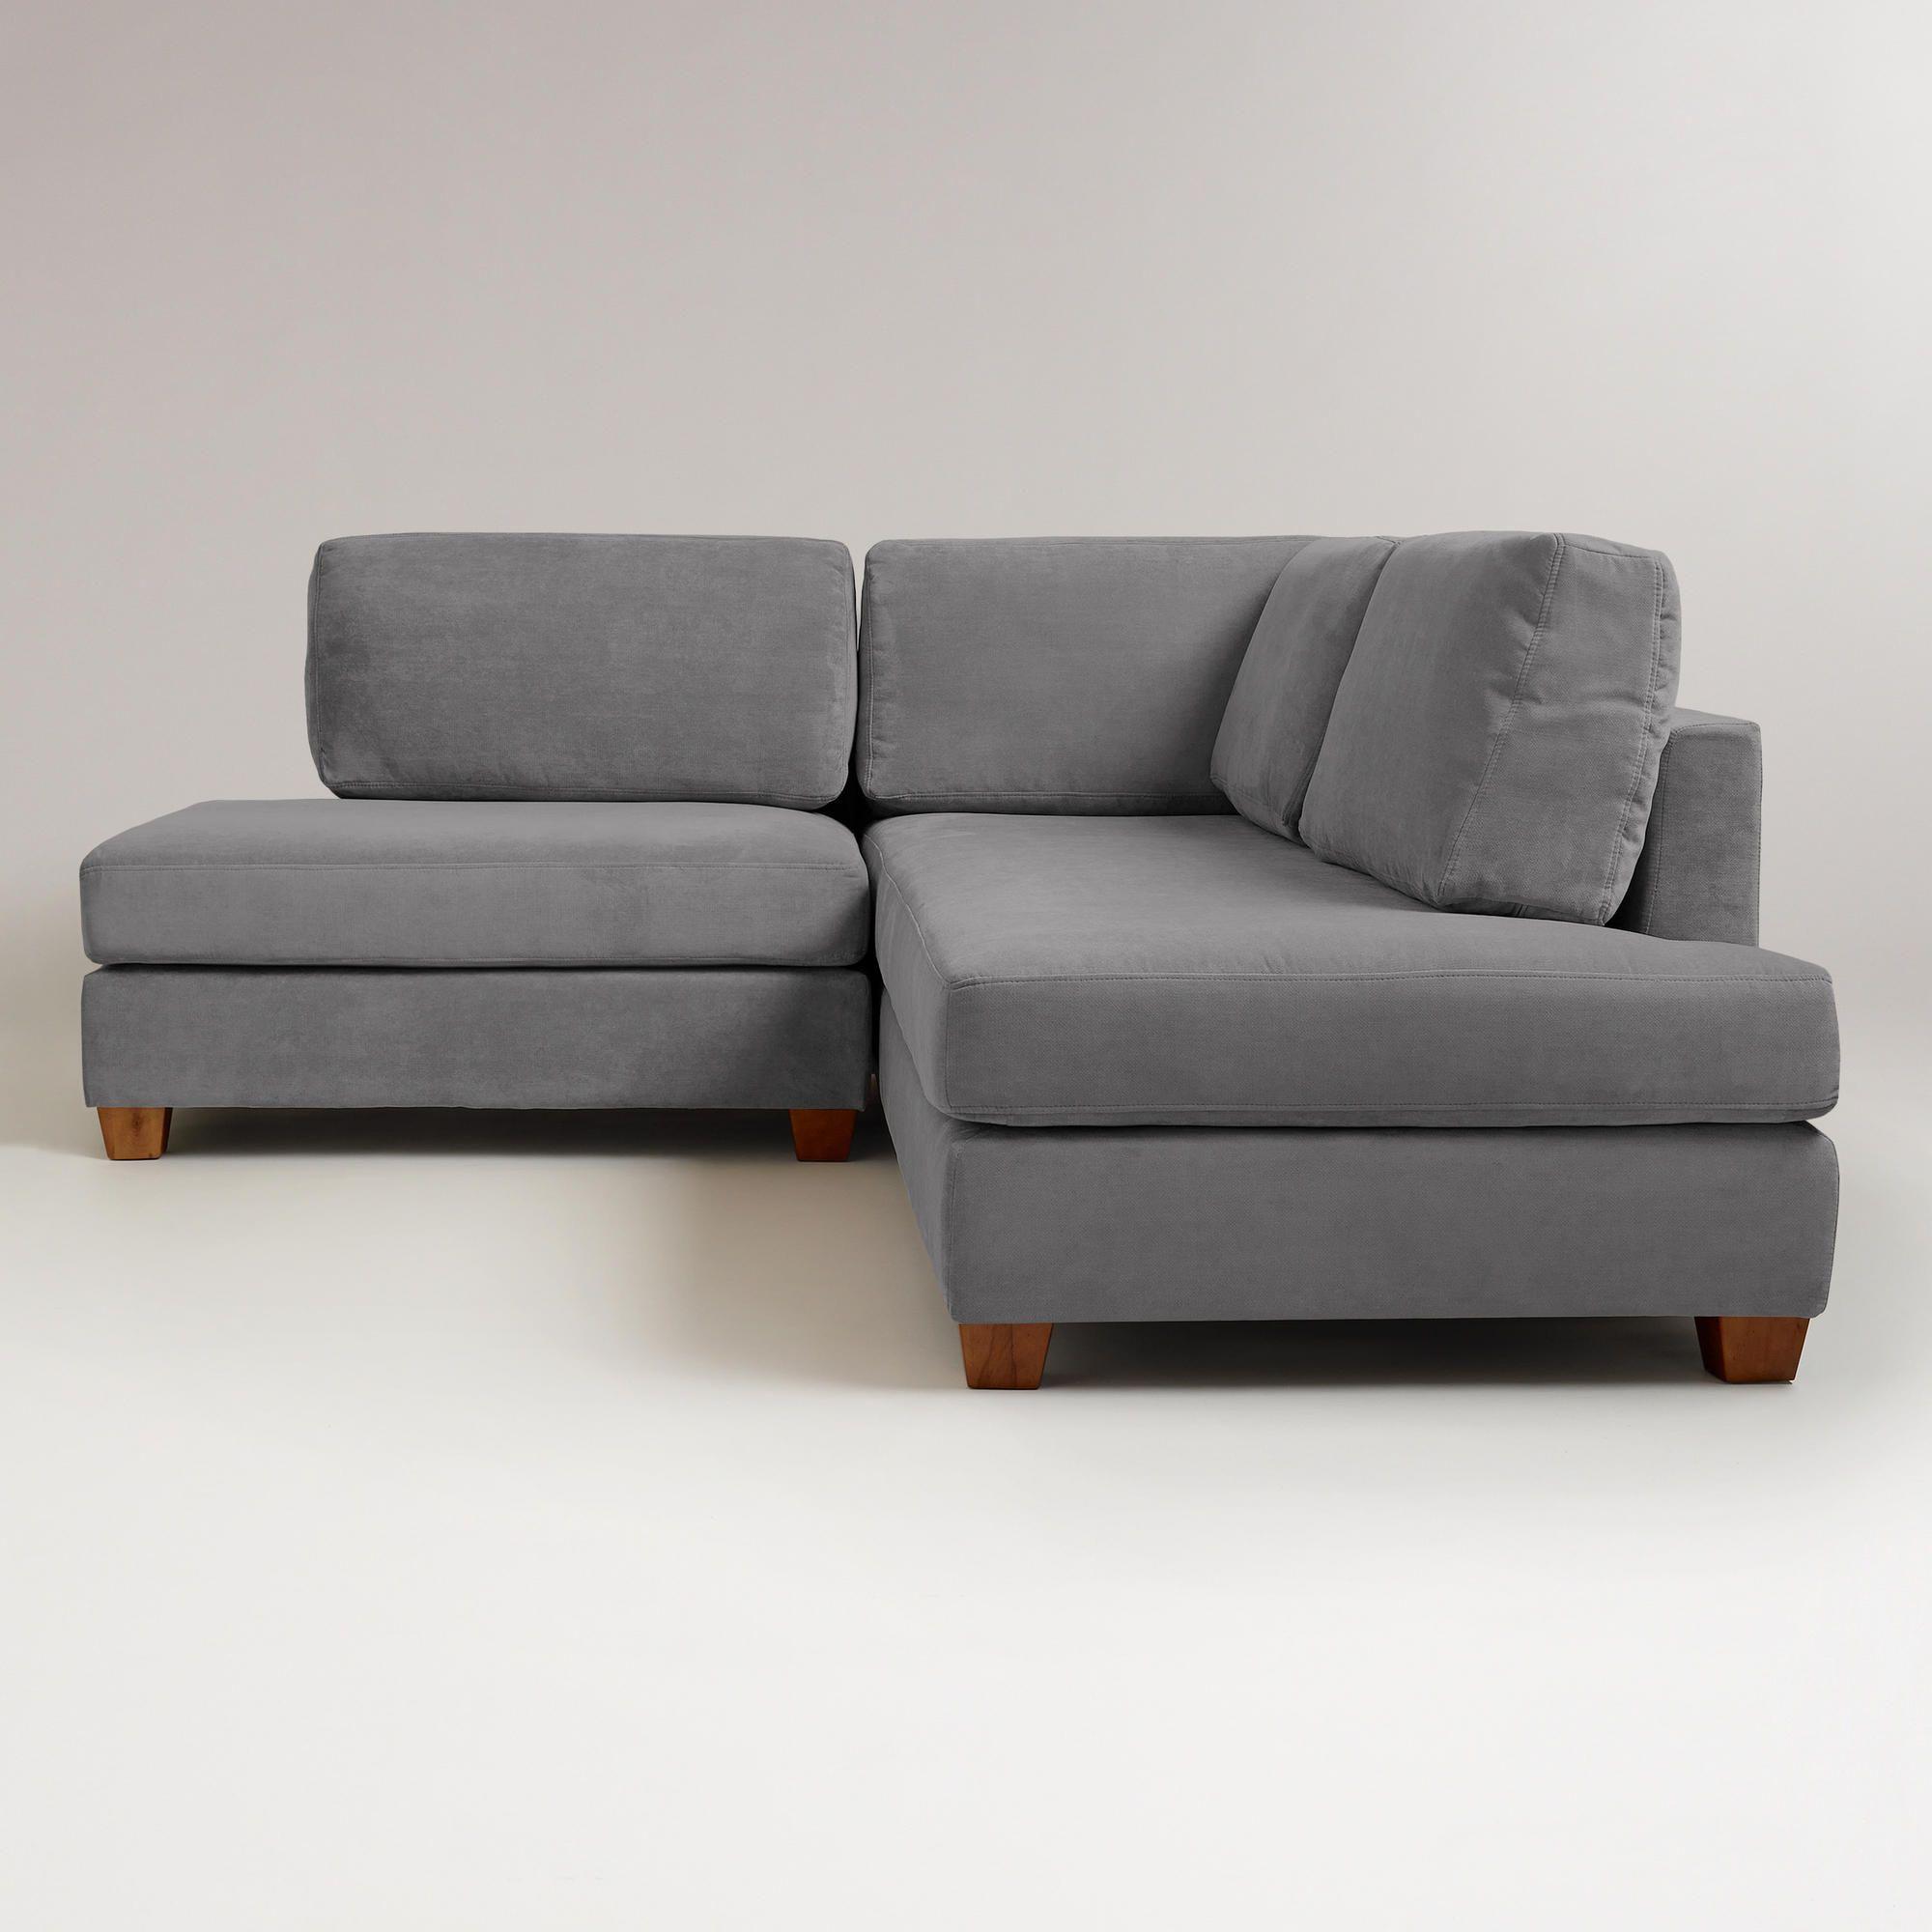 Charcoal Wyatt Sectional Sofa World Market